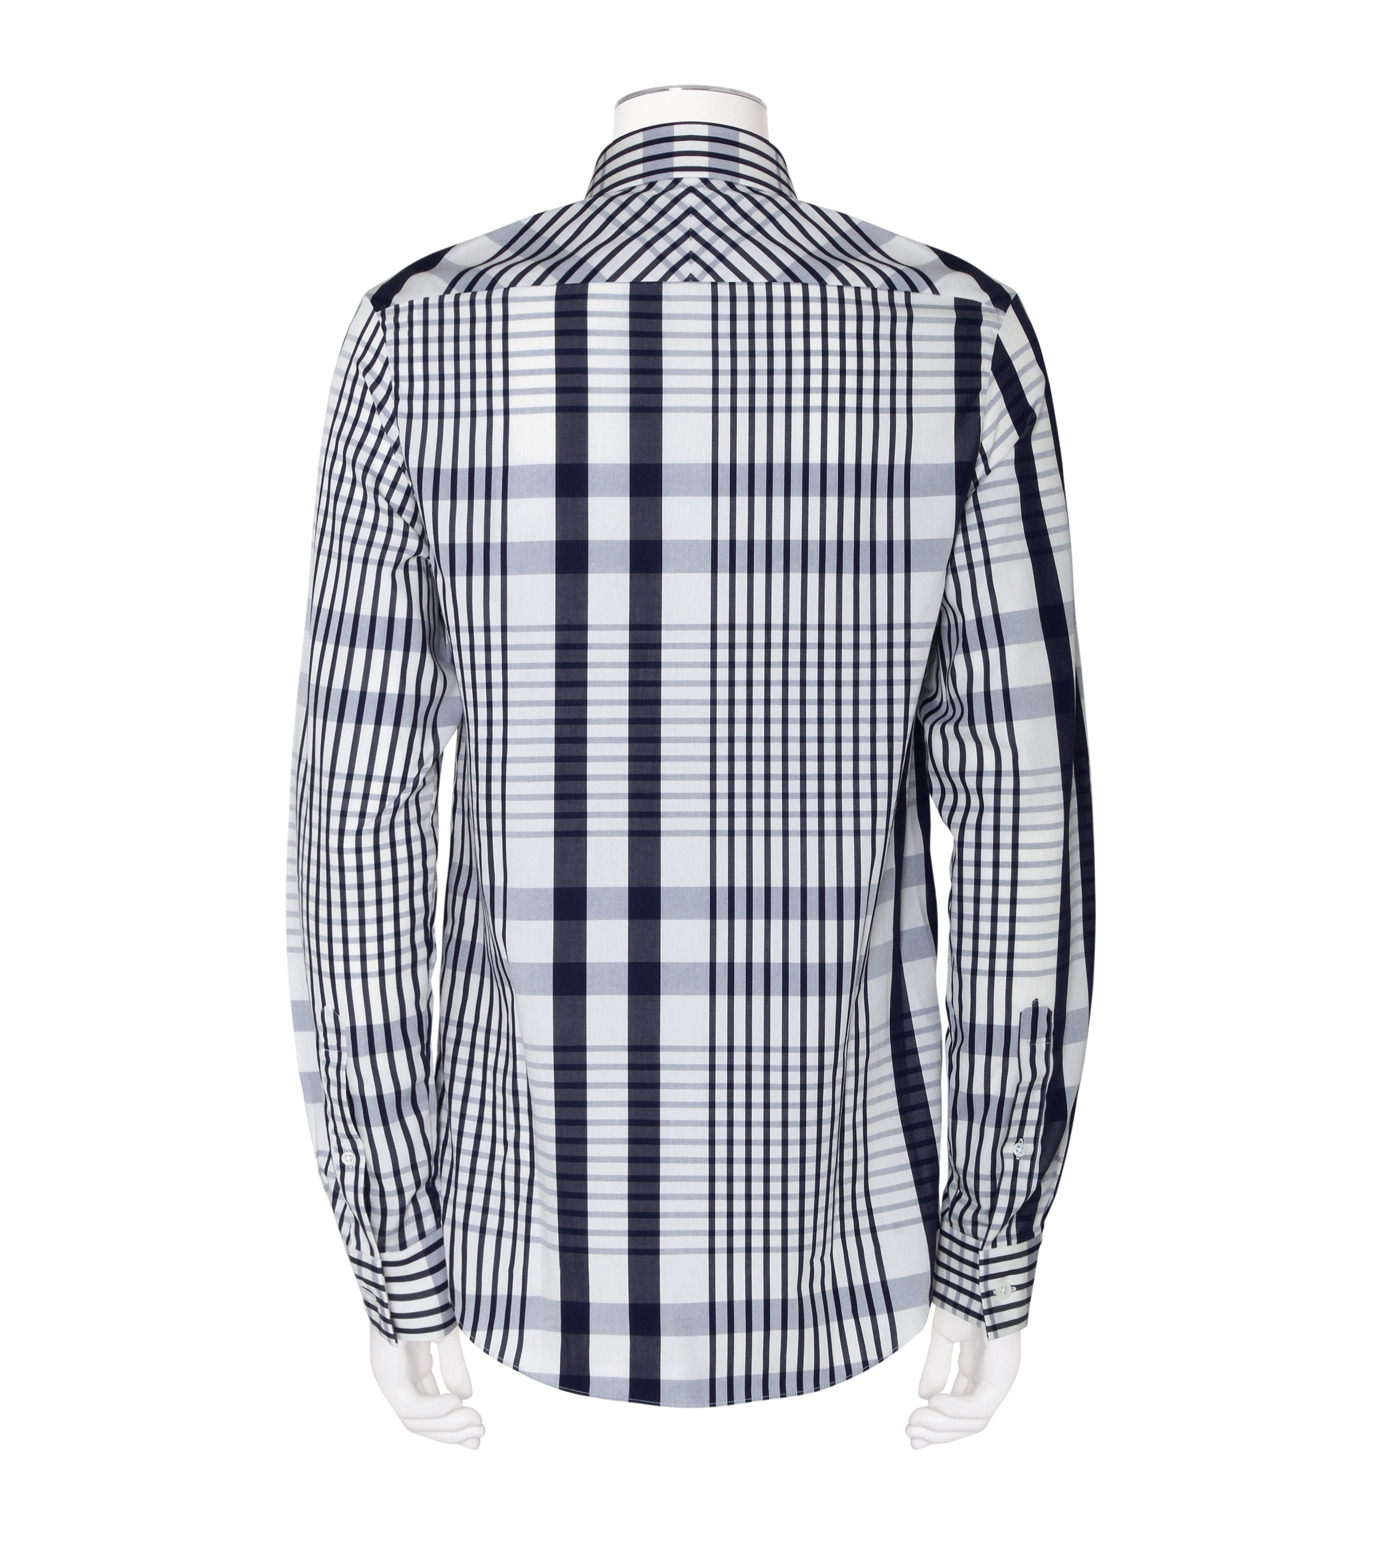 ACNE STUDIOS(アクネ ストゥディオズ)のCheck Shirt-NAVY(シャツ/shirt)-21K163-93 拡大詳細画像2